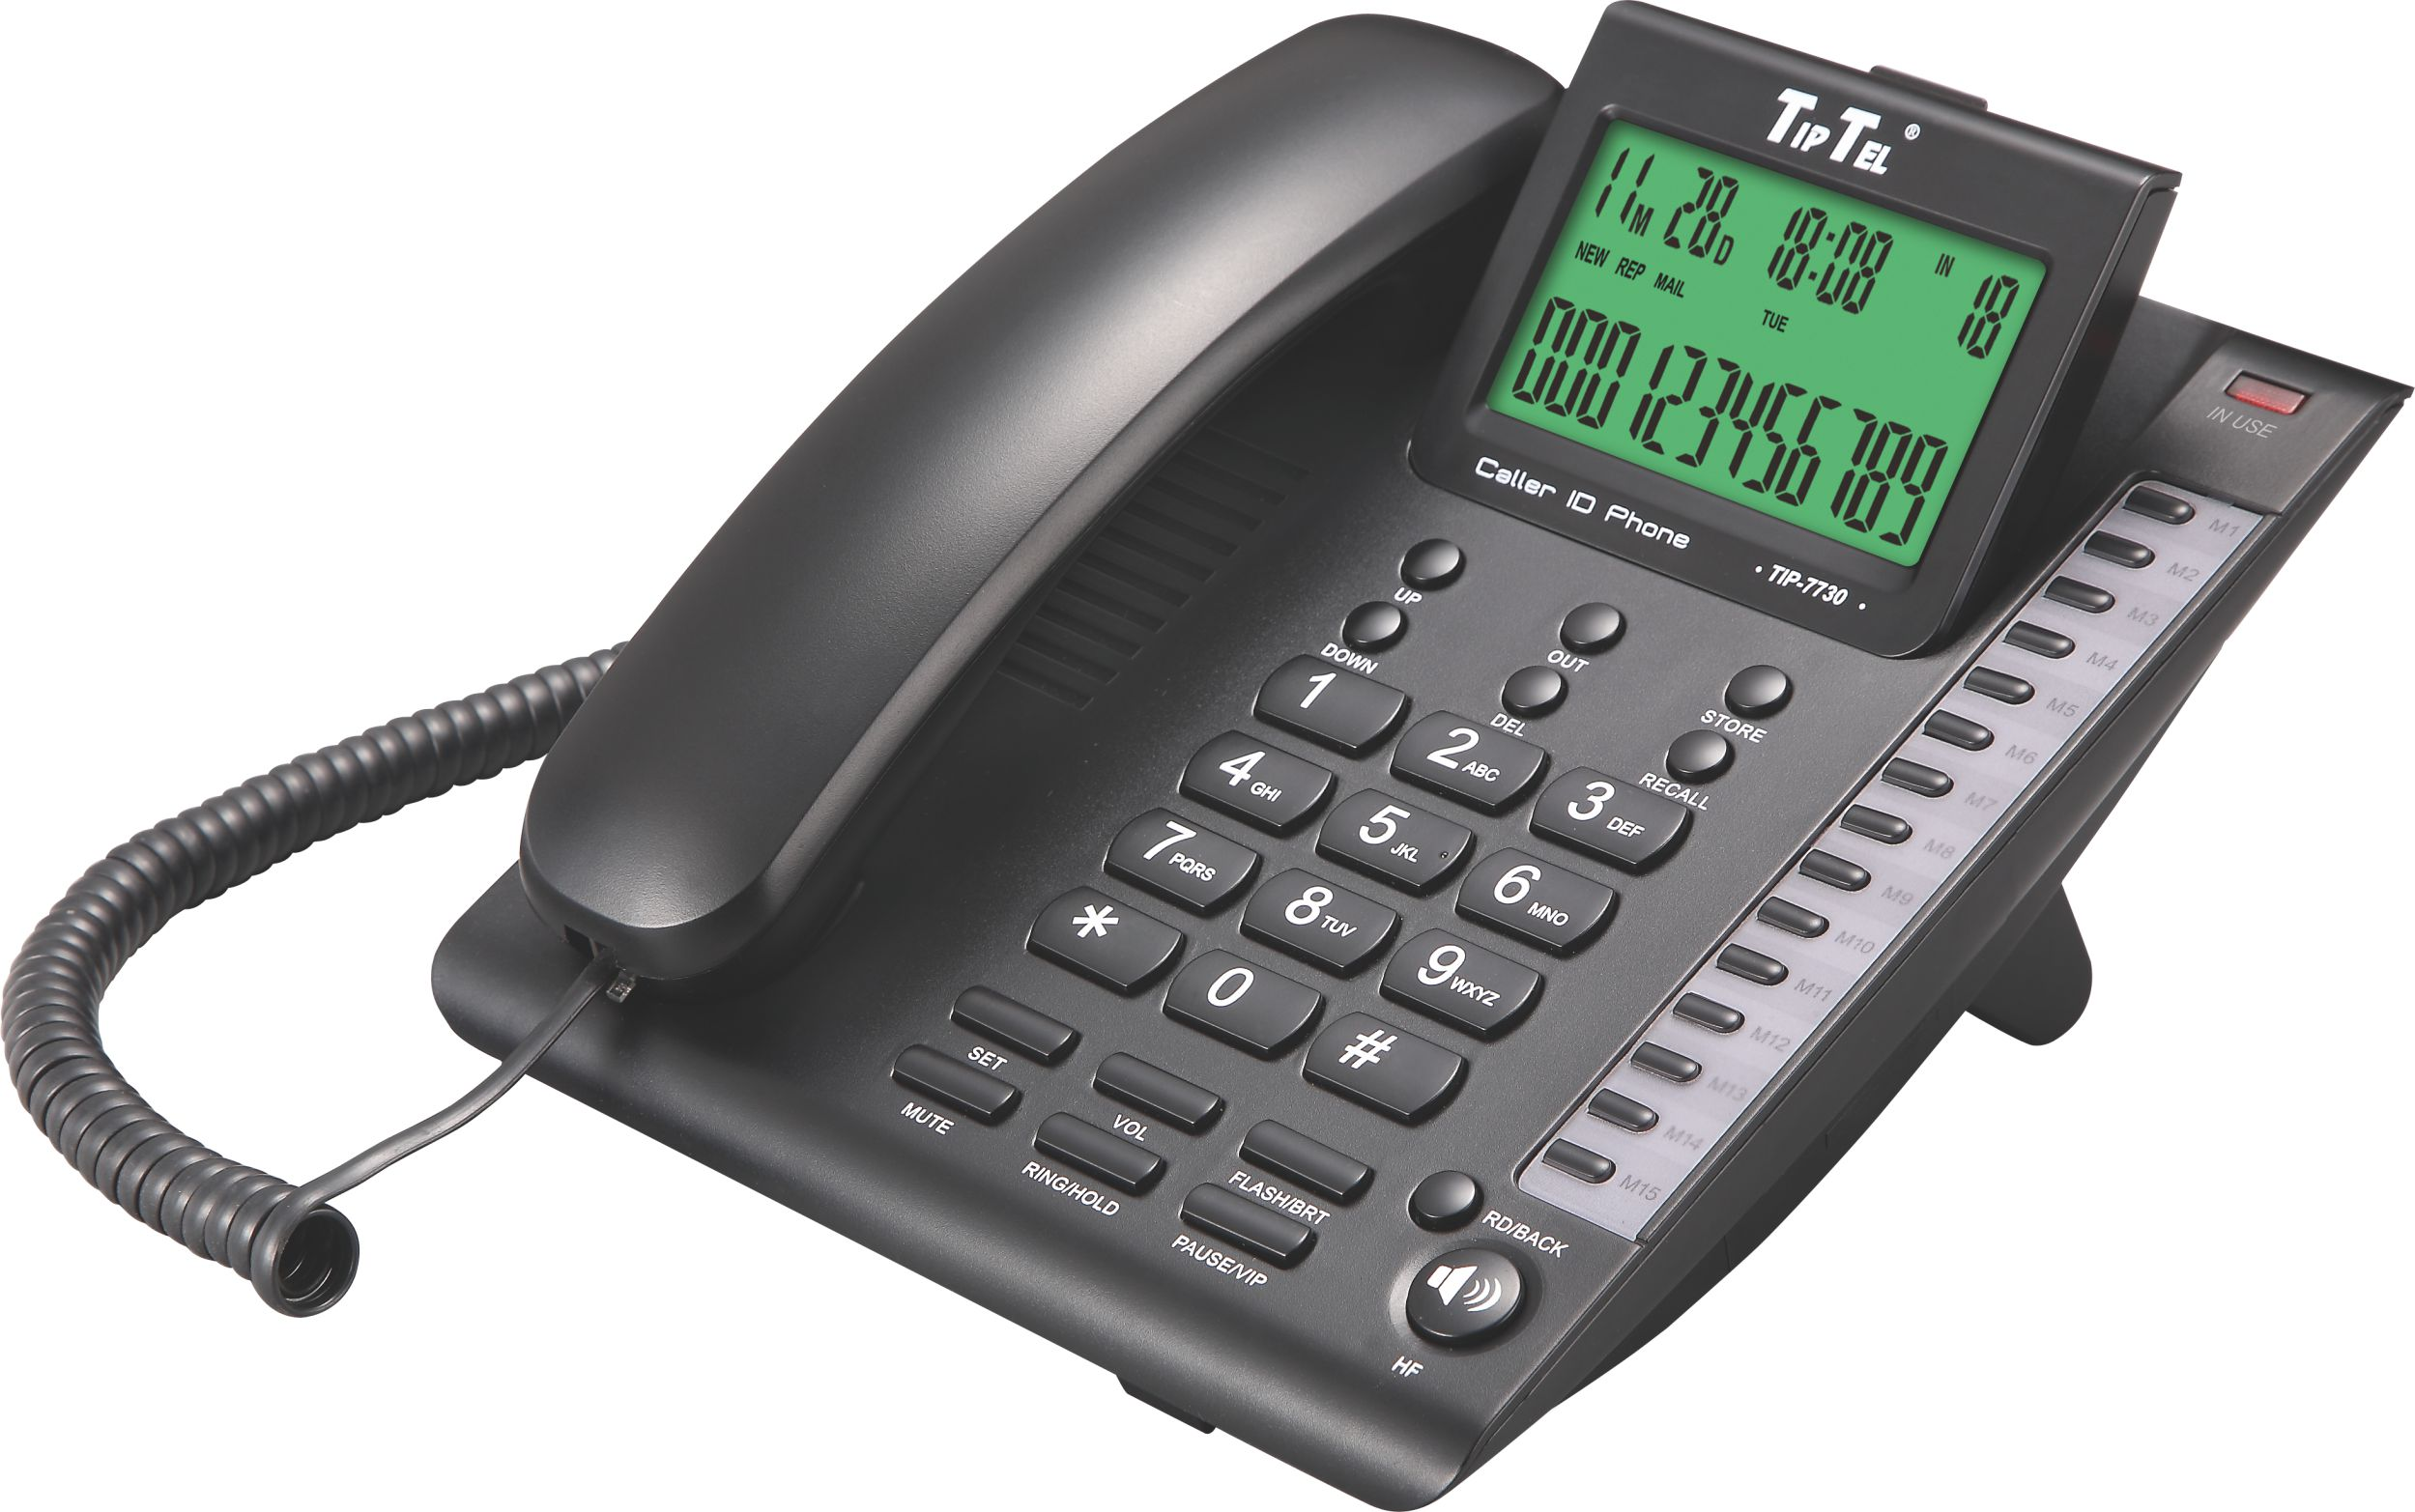 تلفن سی اف ال مدل 7730